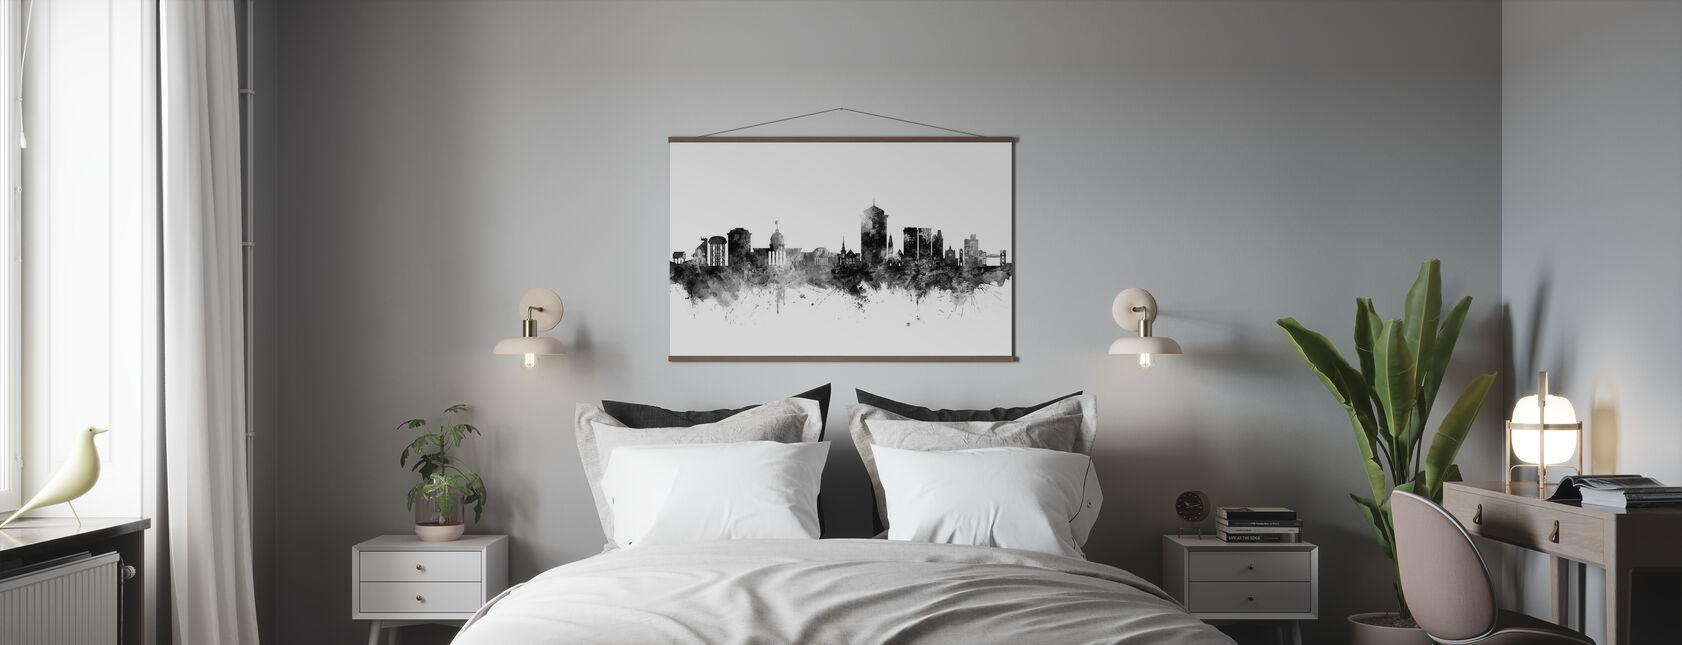 Skyline van Montgomery Alabama - Poster - Slaapkamer